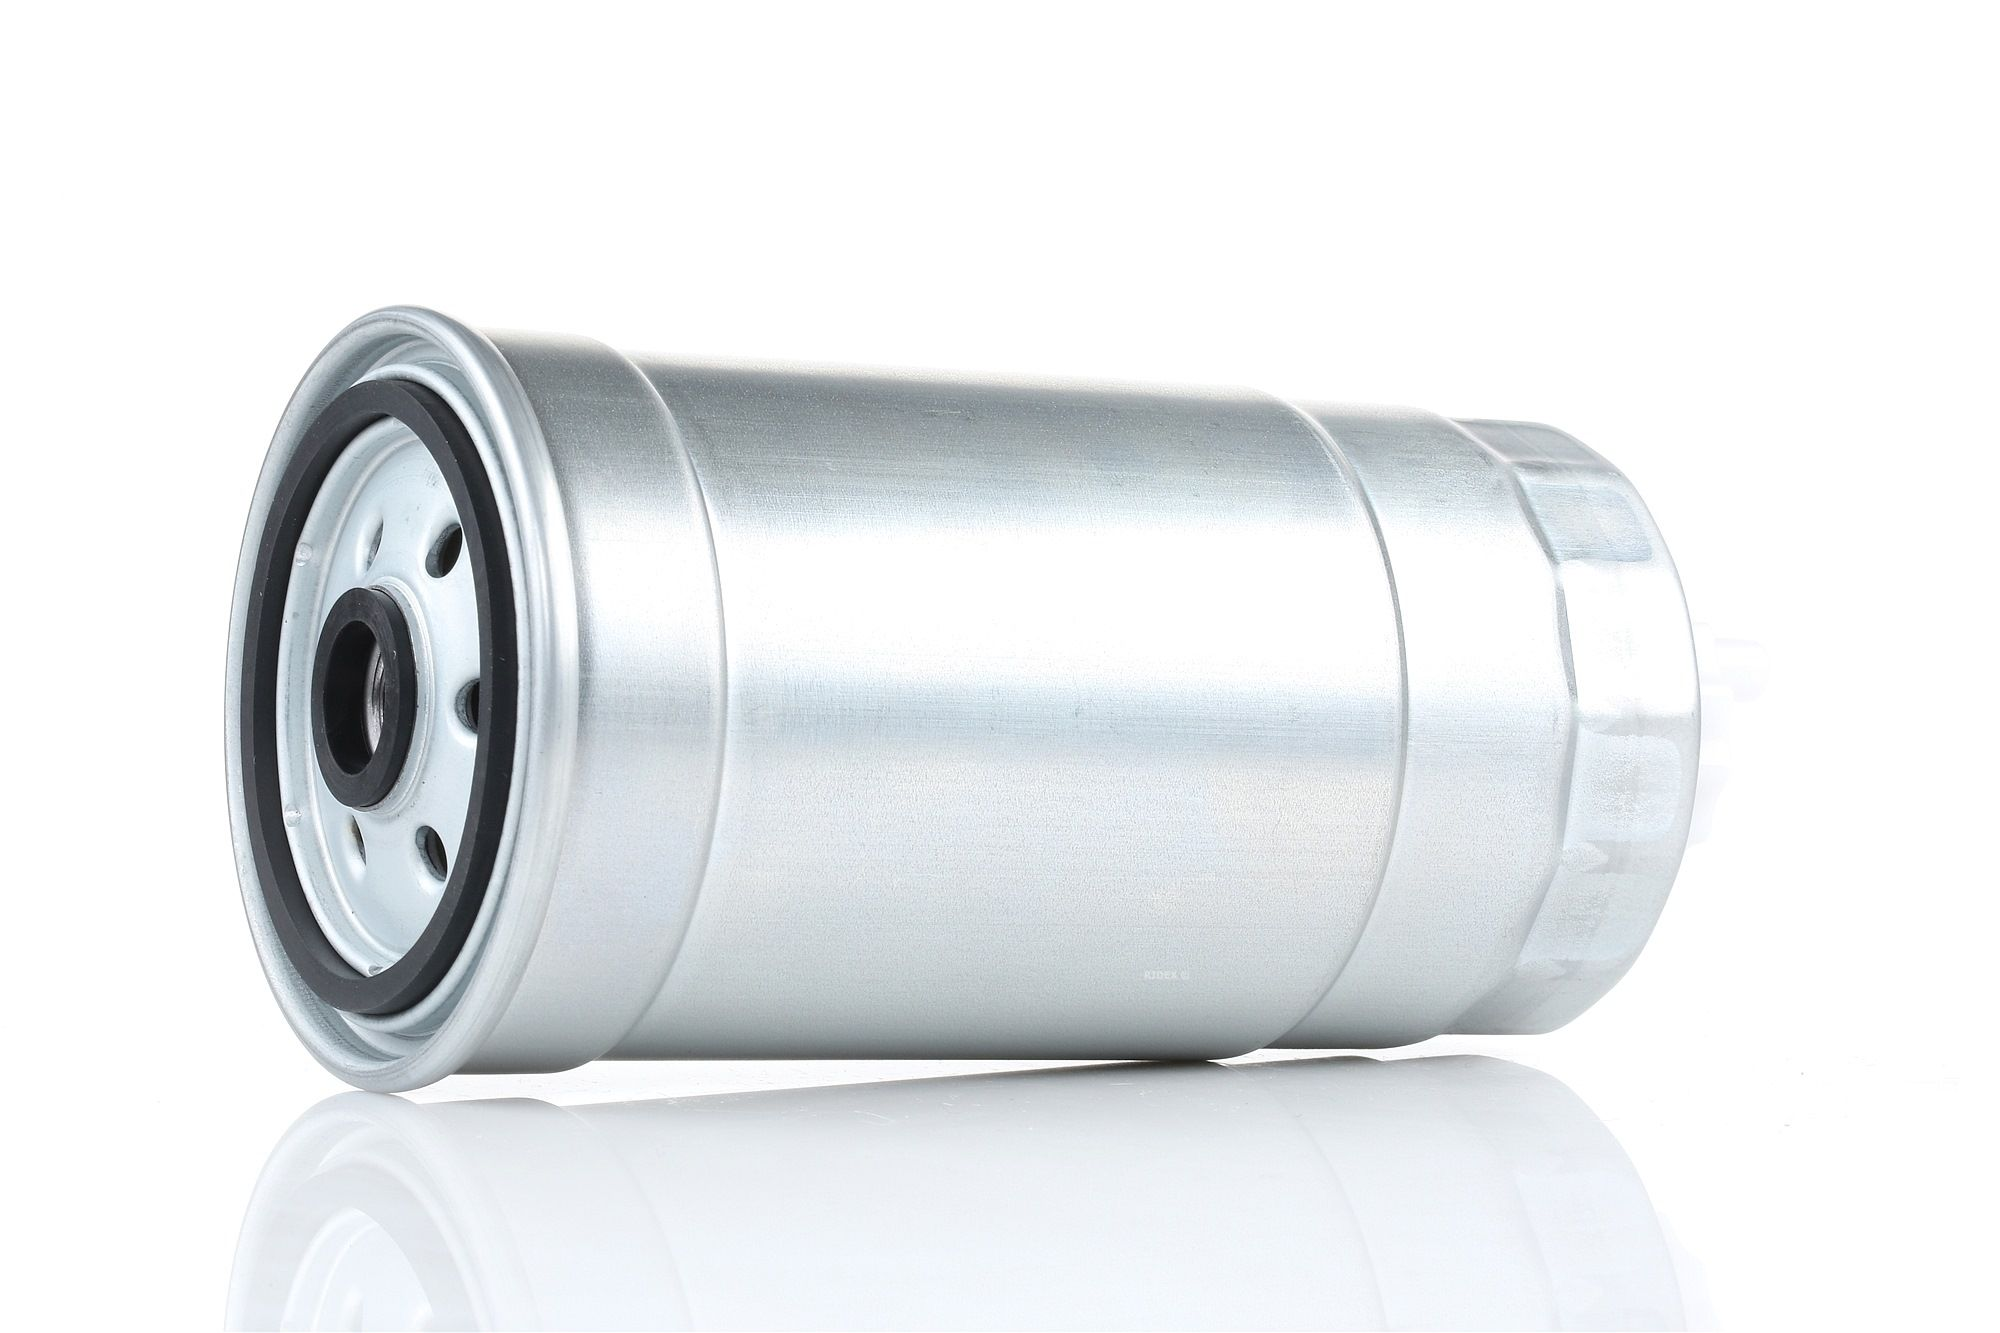 Original Palivový filtr 9F0109 Hyundai